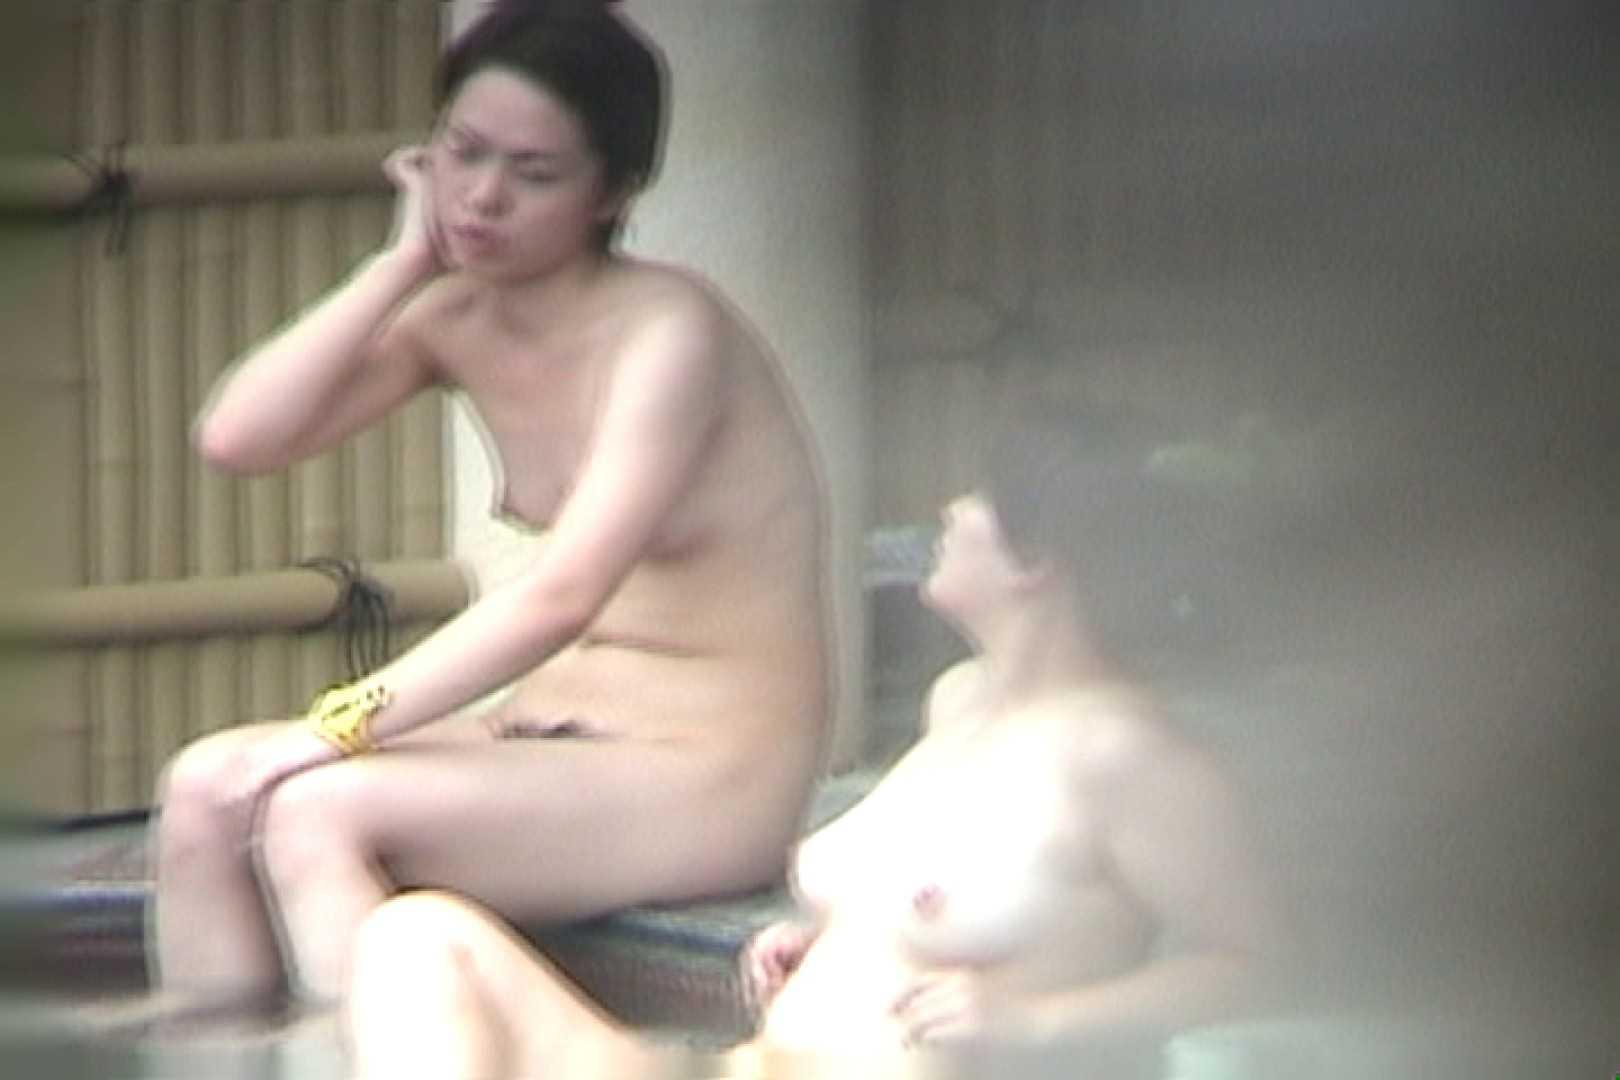 Aquaな露天風呂Vol.558 OLセックス | 盗撮  81画像 64